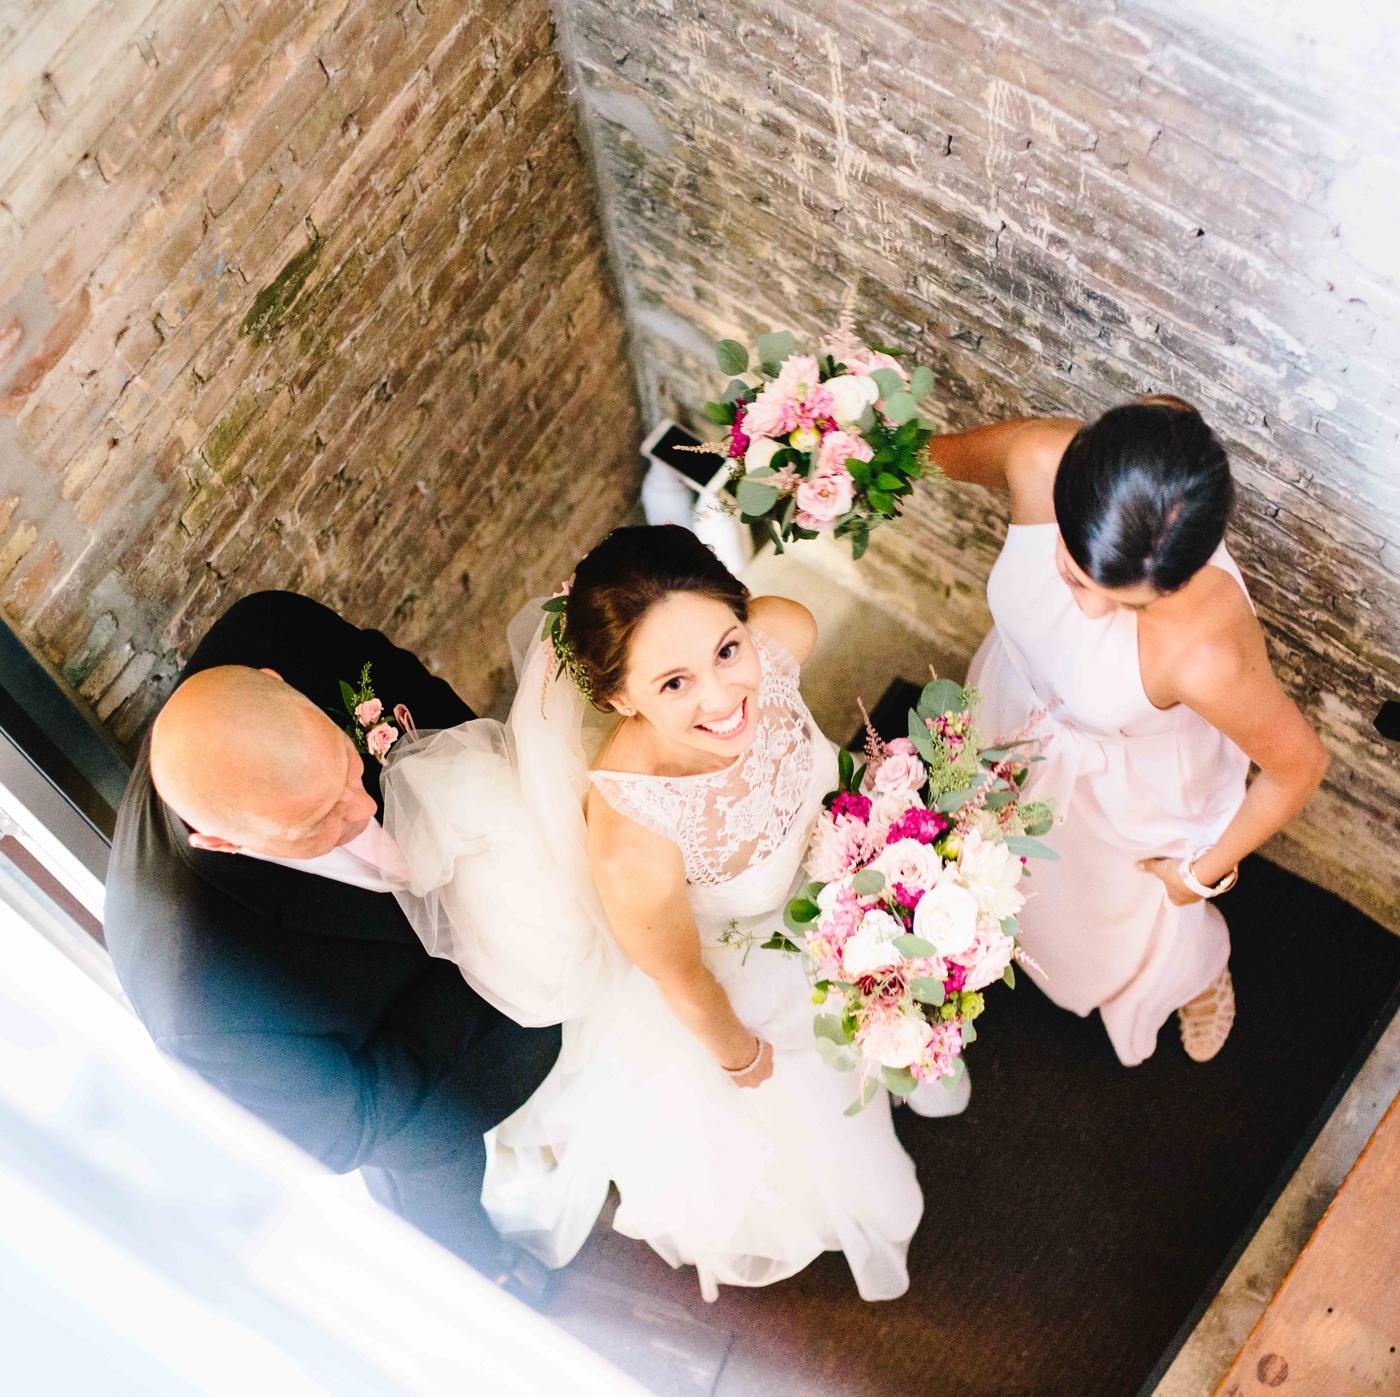 chicago-fine-art-wedding-photography-tyma22